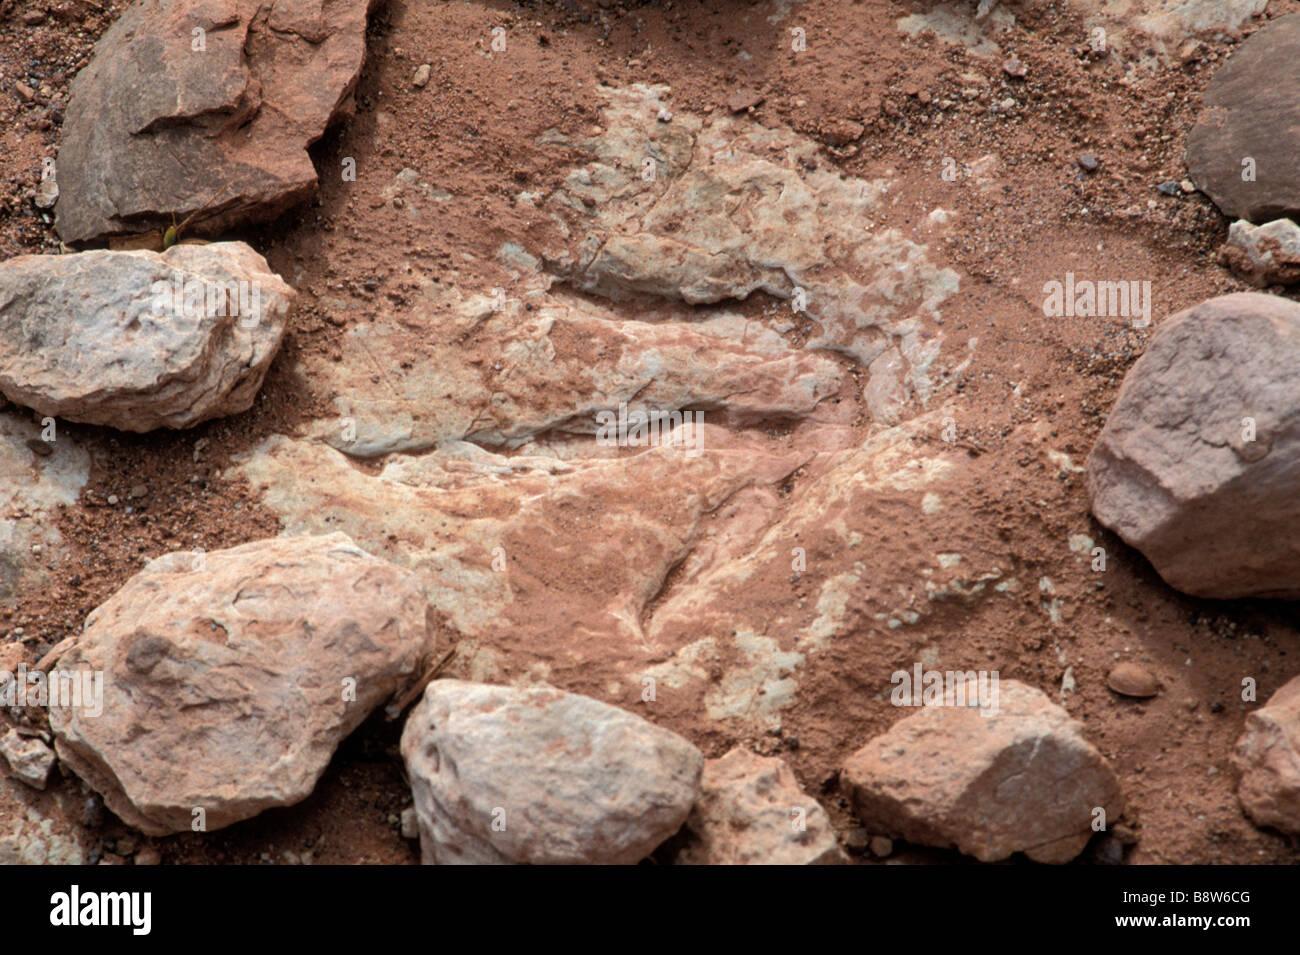 Fossil dinosaur footprint near Tuba City Arizona - Stock Image